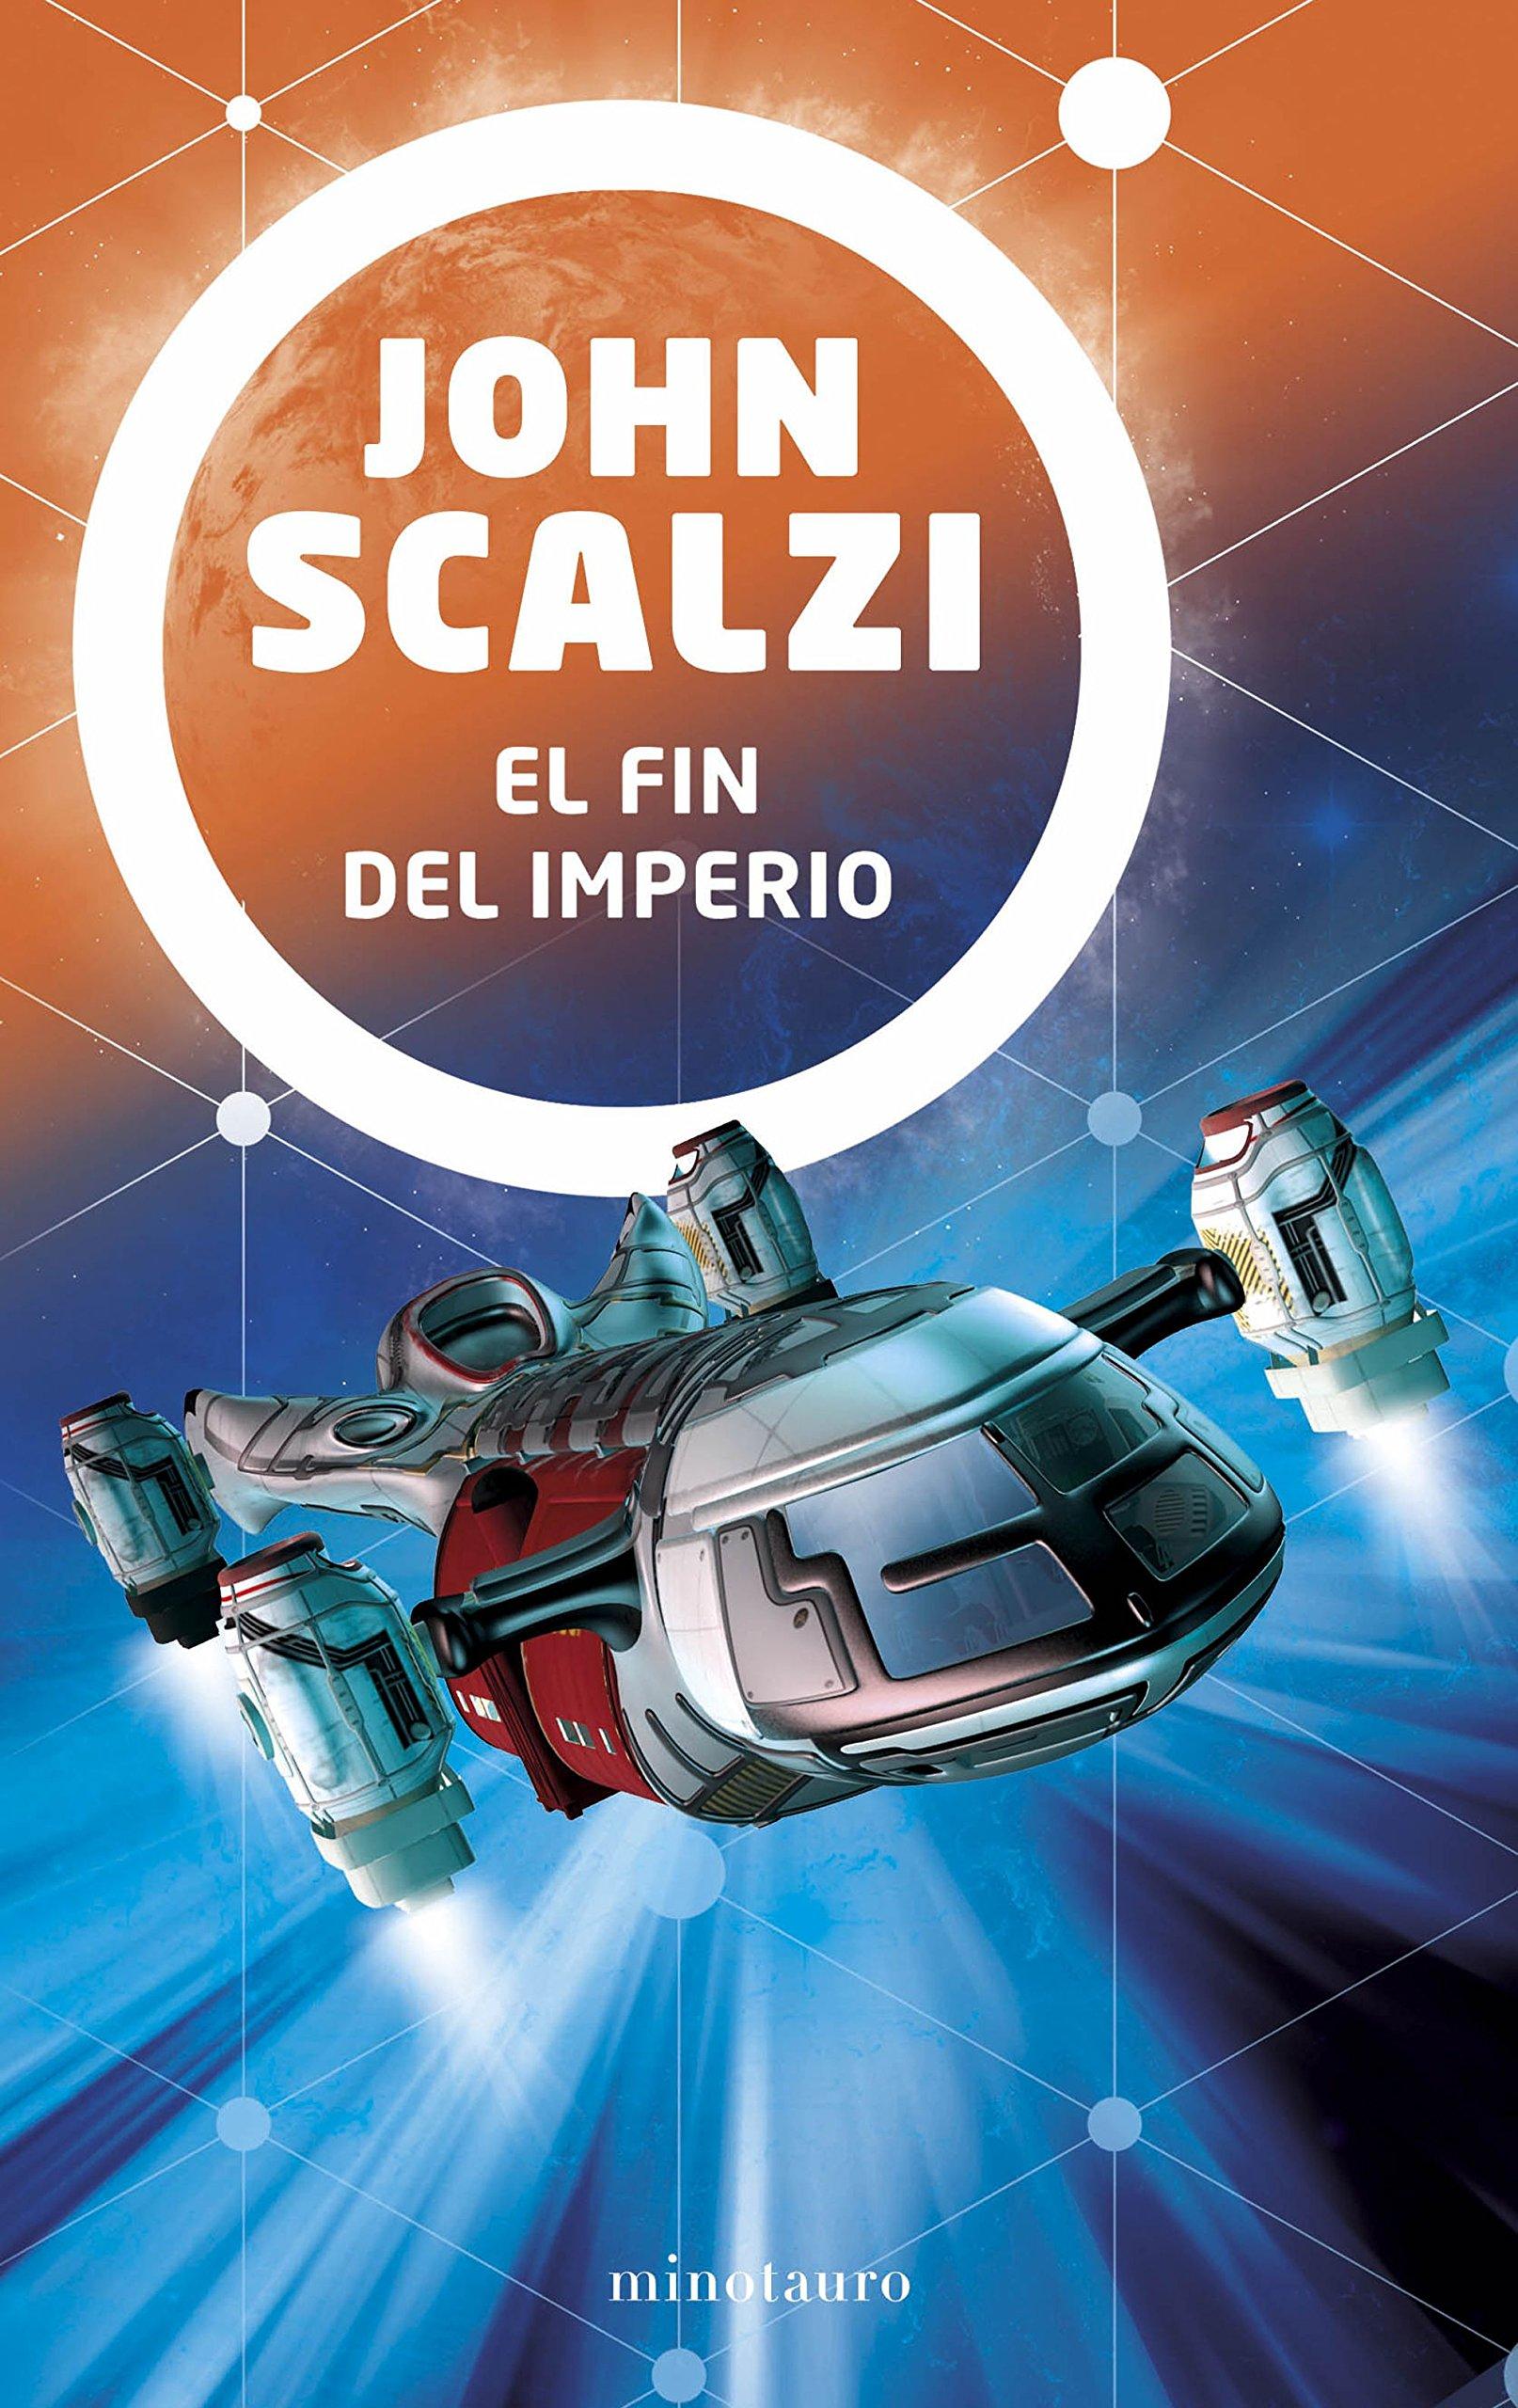 El fin del imperio (Ciencia Ficción) Tapa blanda – 23 oct 2018 John Scalzi Simon Saito Navarro Minotauro 8445005626